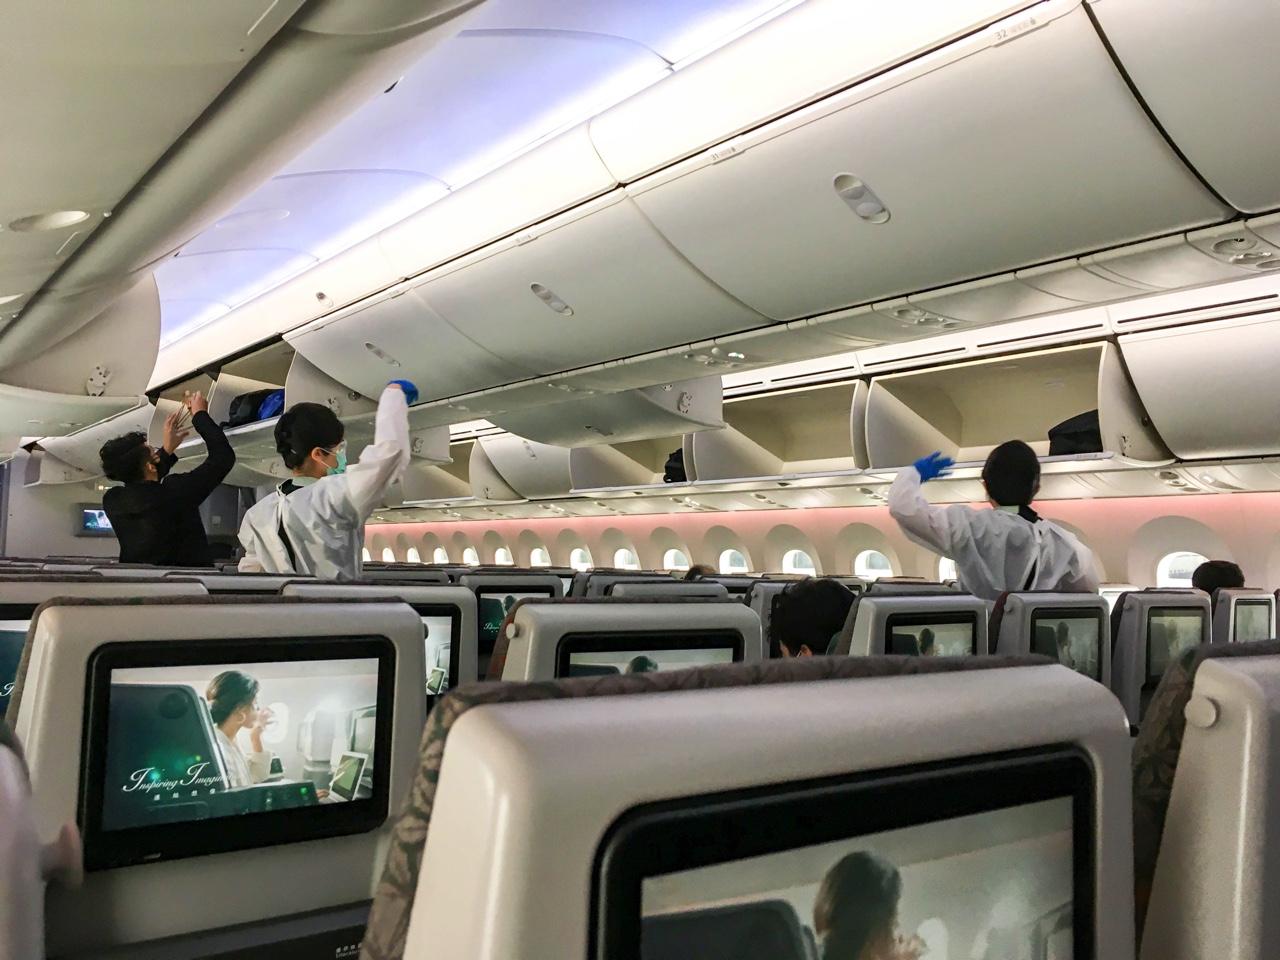 EVA Airの飛行機内